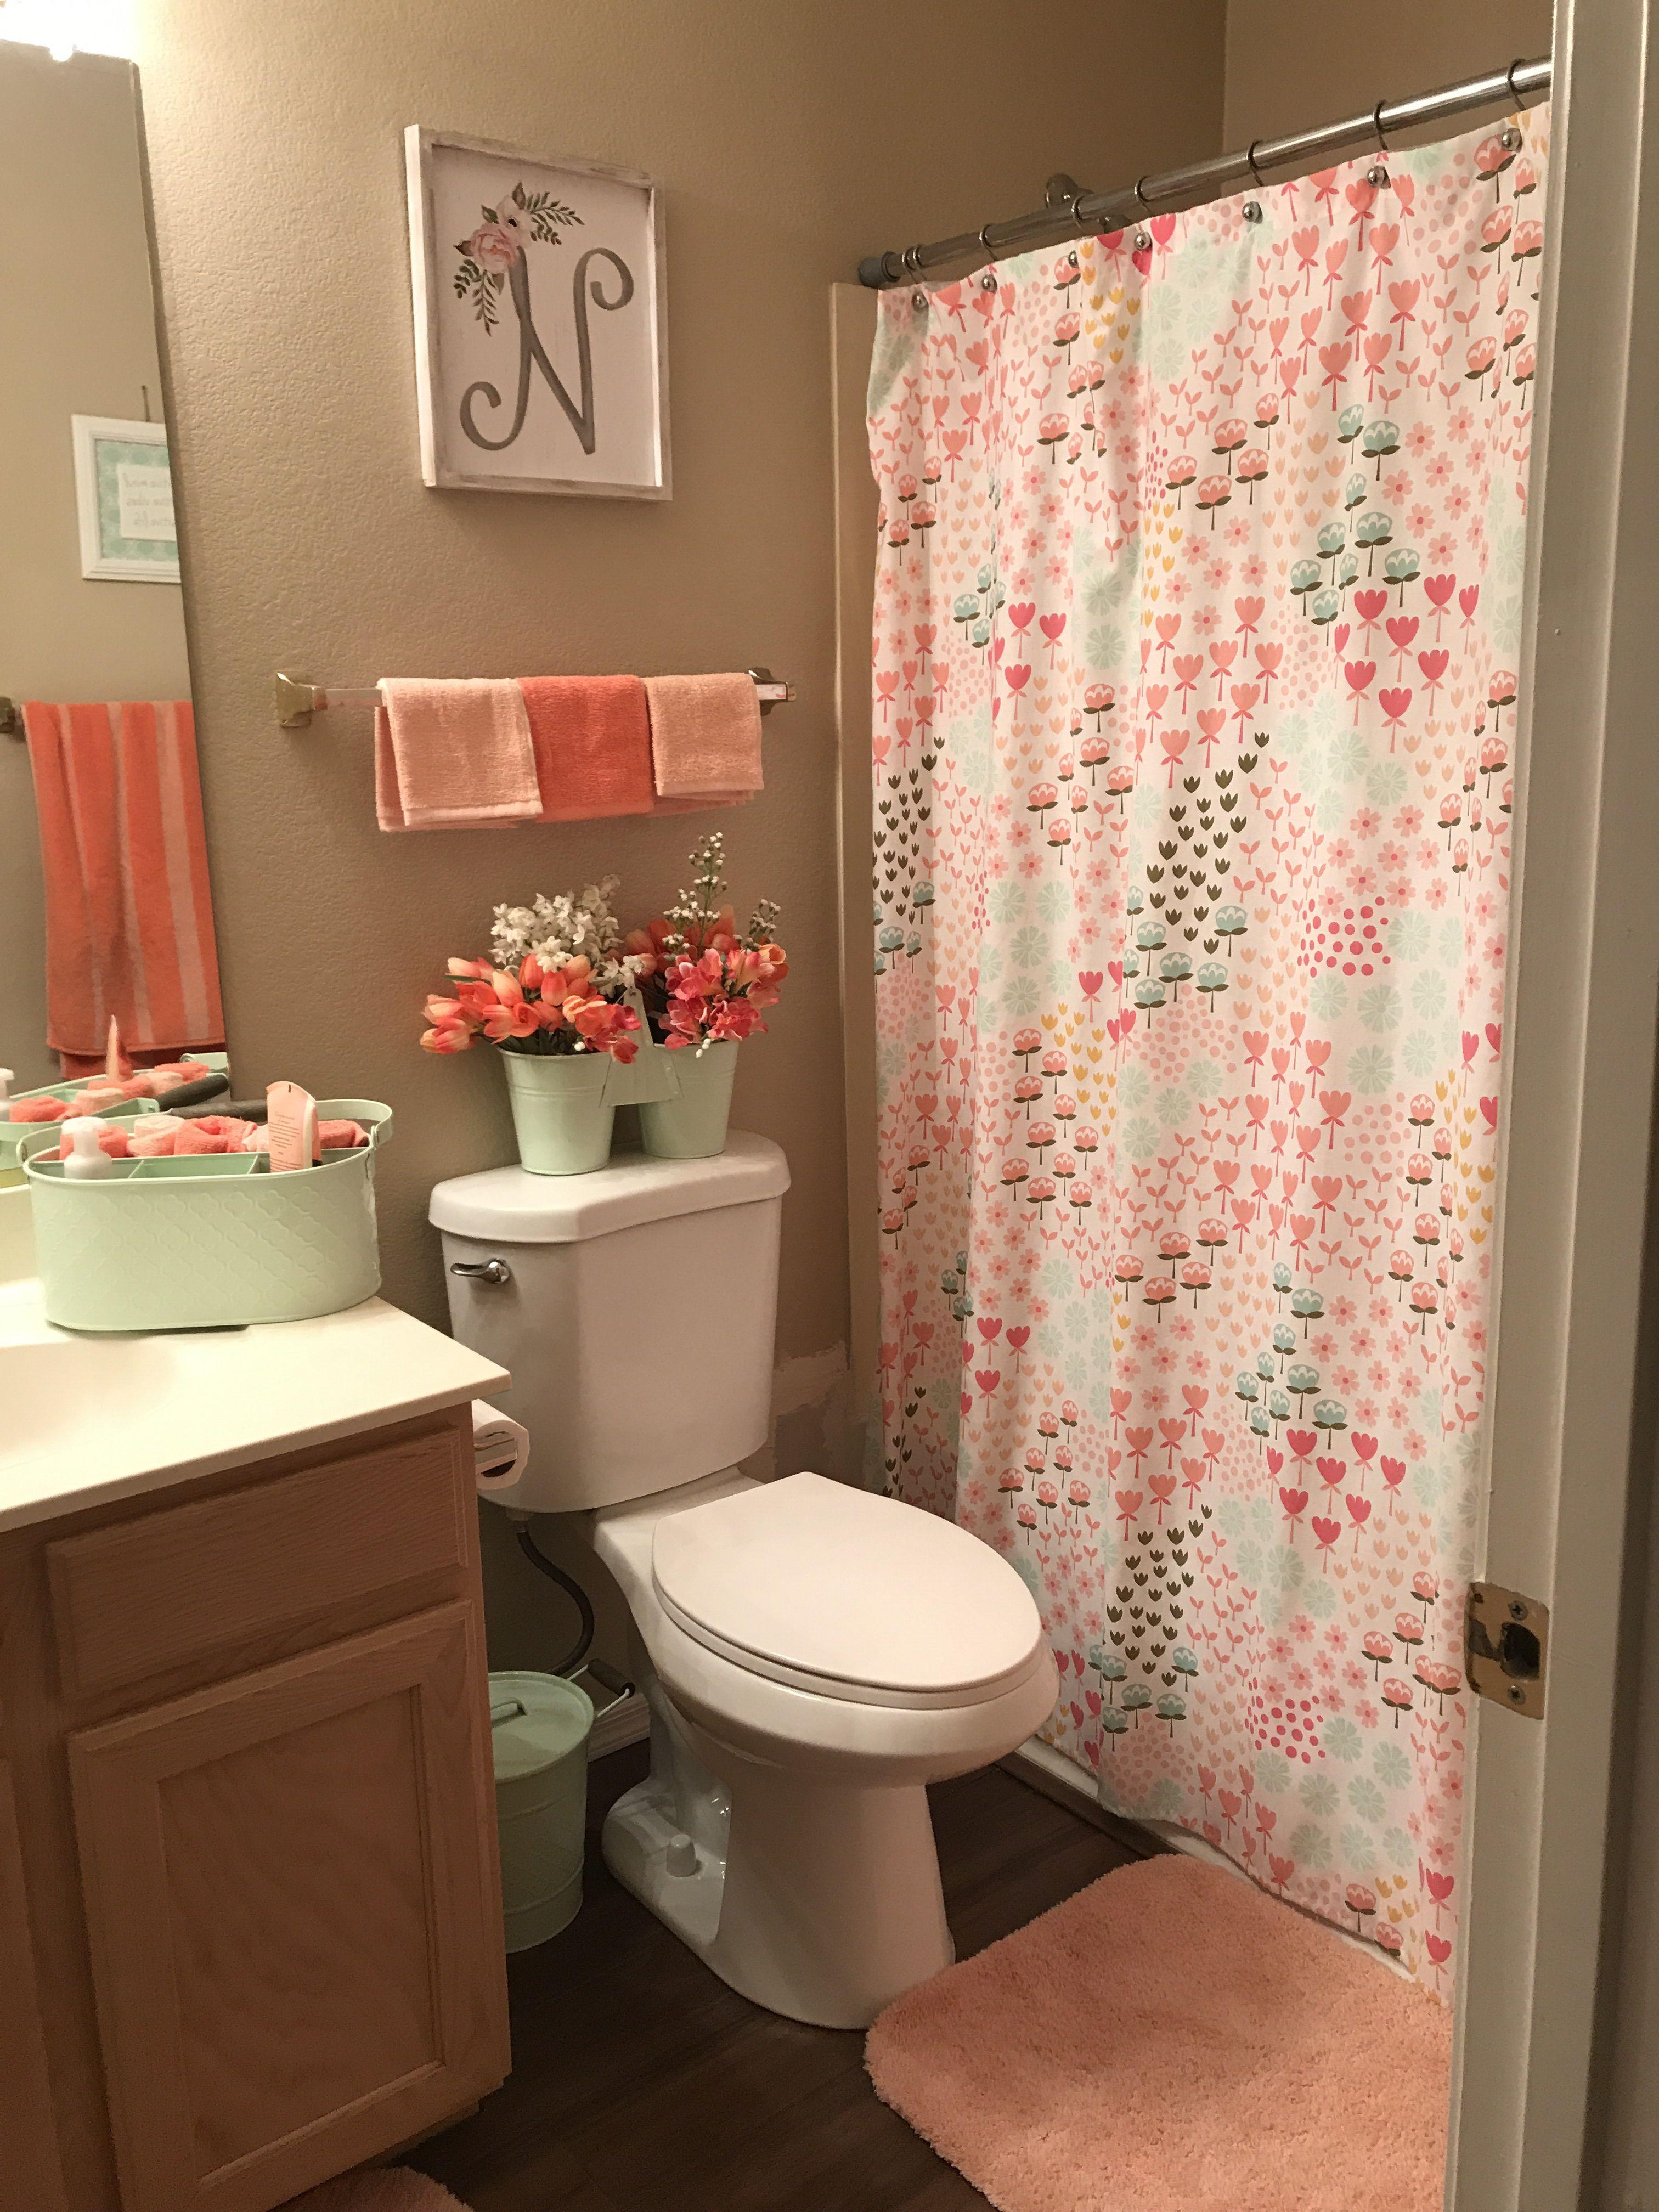 Pin Dominiquemae390 Ig Only1 Queenk Spaammm Ig Prettygurl Spaaam Restroom Decor Bathroom Decor Apartment Bathroom Decor